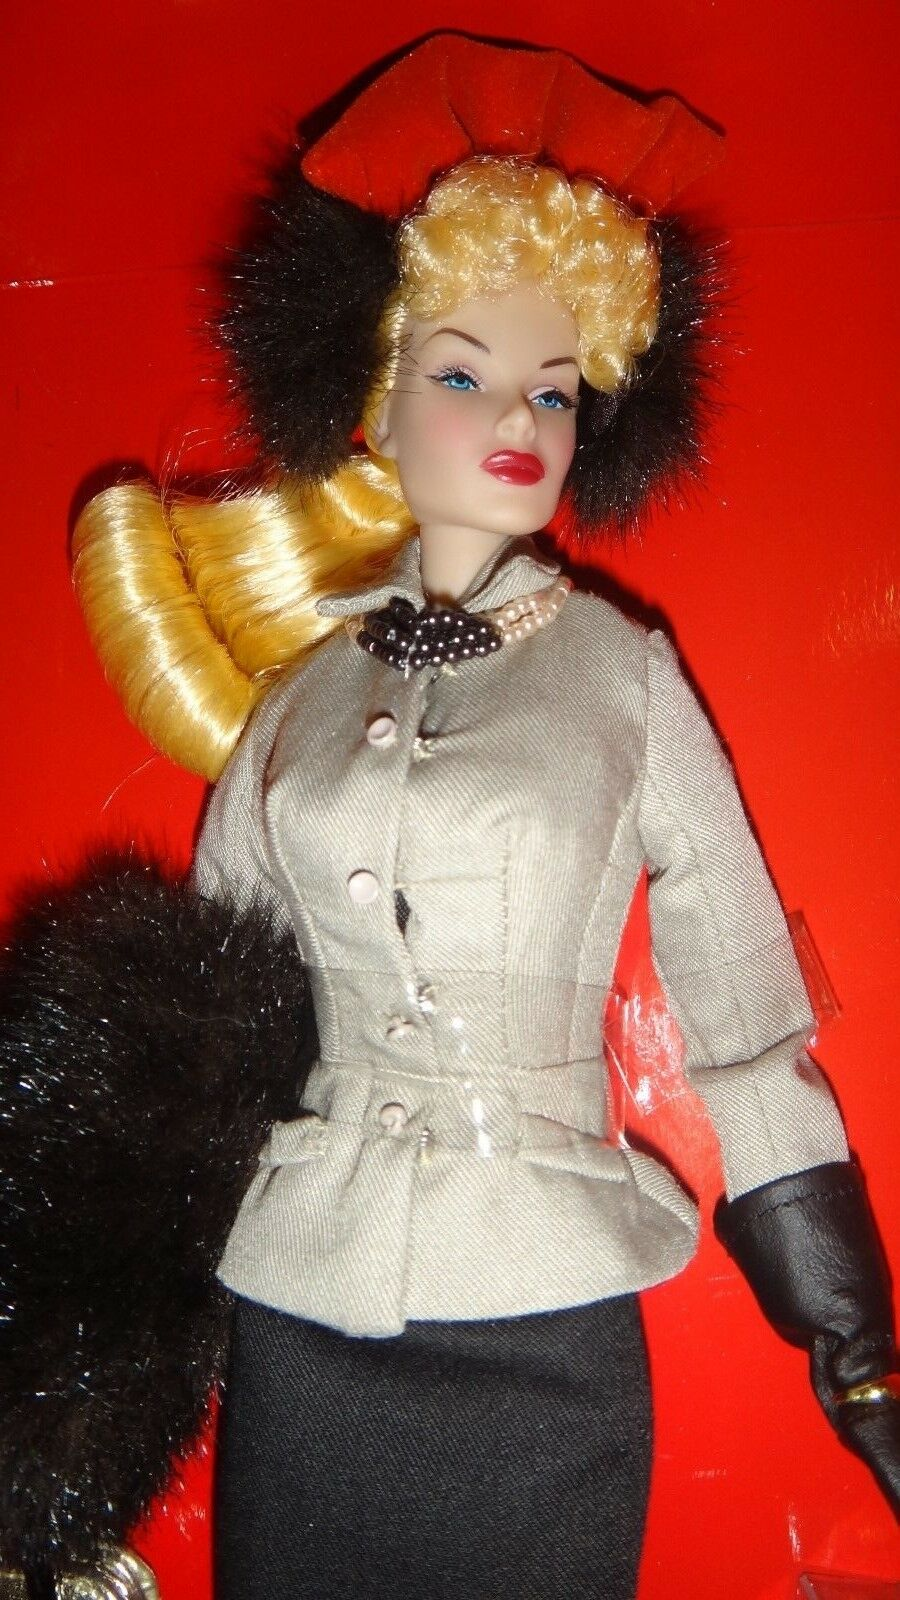 Moda realeza Hollywood Lana Turner Muñeca de regalías Hollywood adecuado